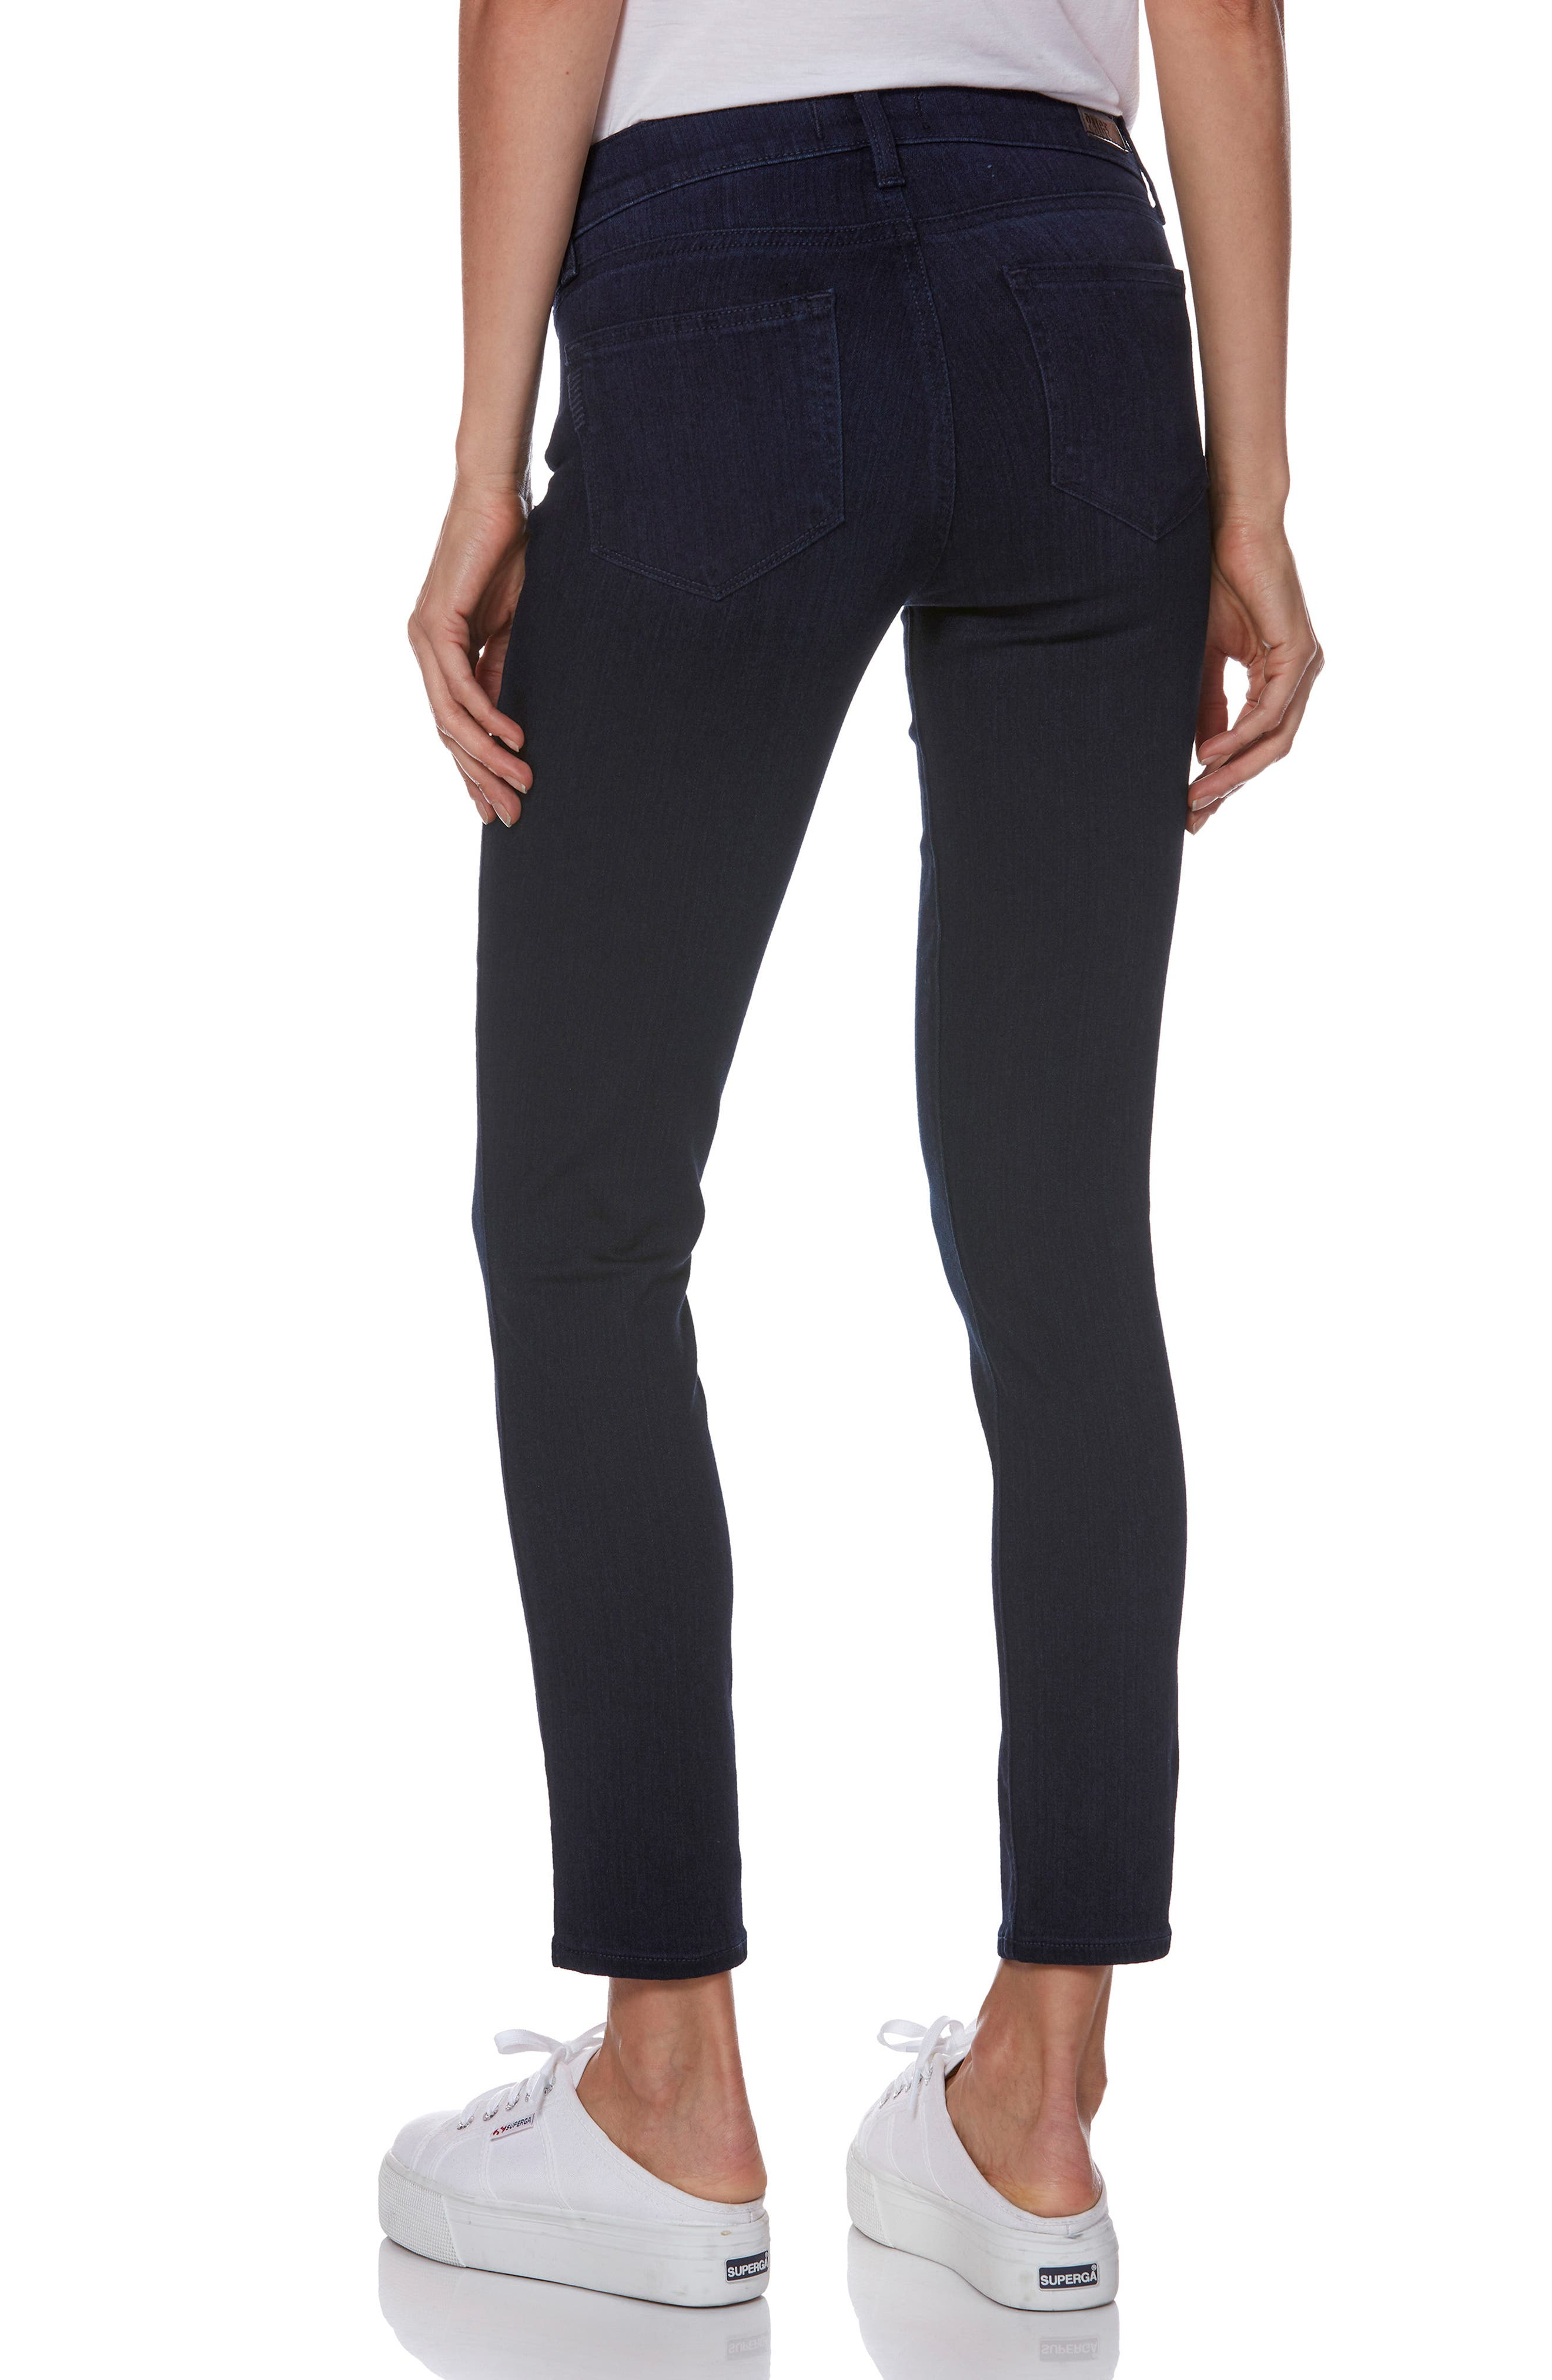 PAIGE,                             Transcend - Verdugo Ultra Skinny Maternity Jeans,                             Alternate thumbnail 2, color,                             LANA